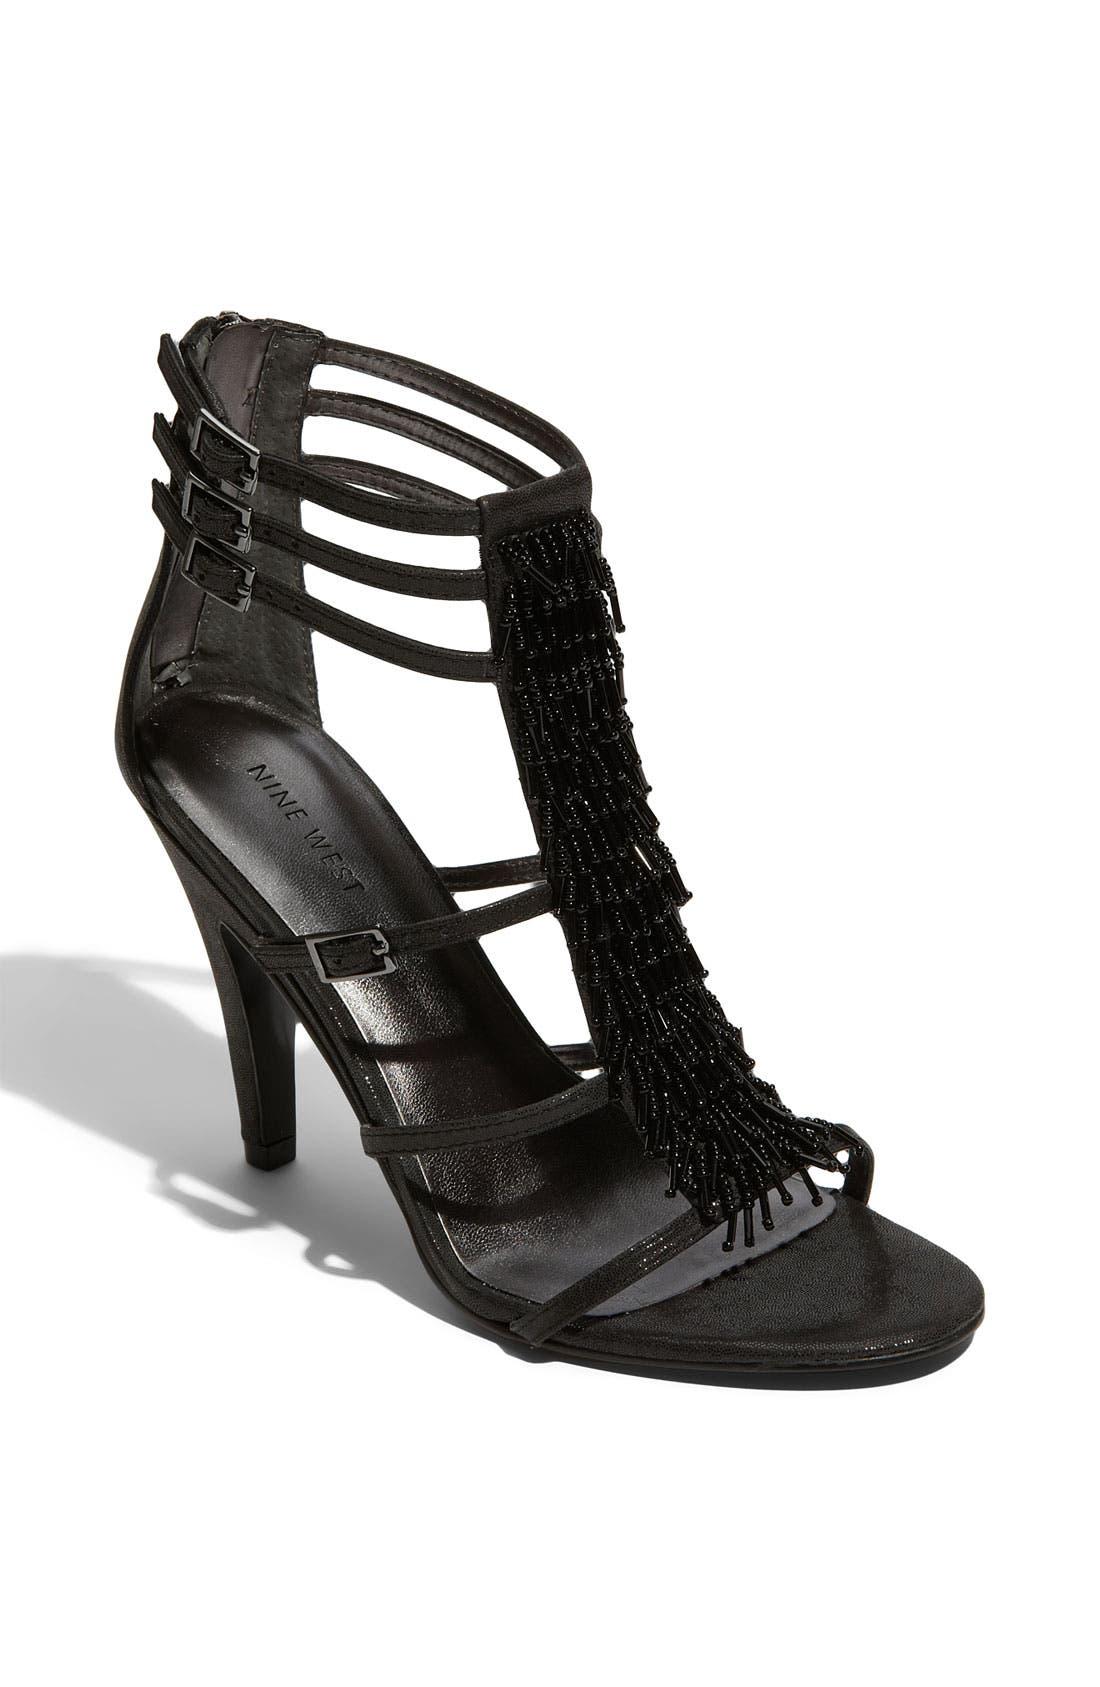 Main Image - Nine West 'Barclay' Sandal